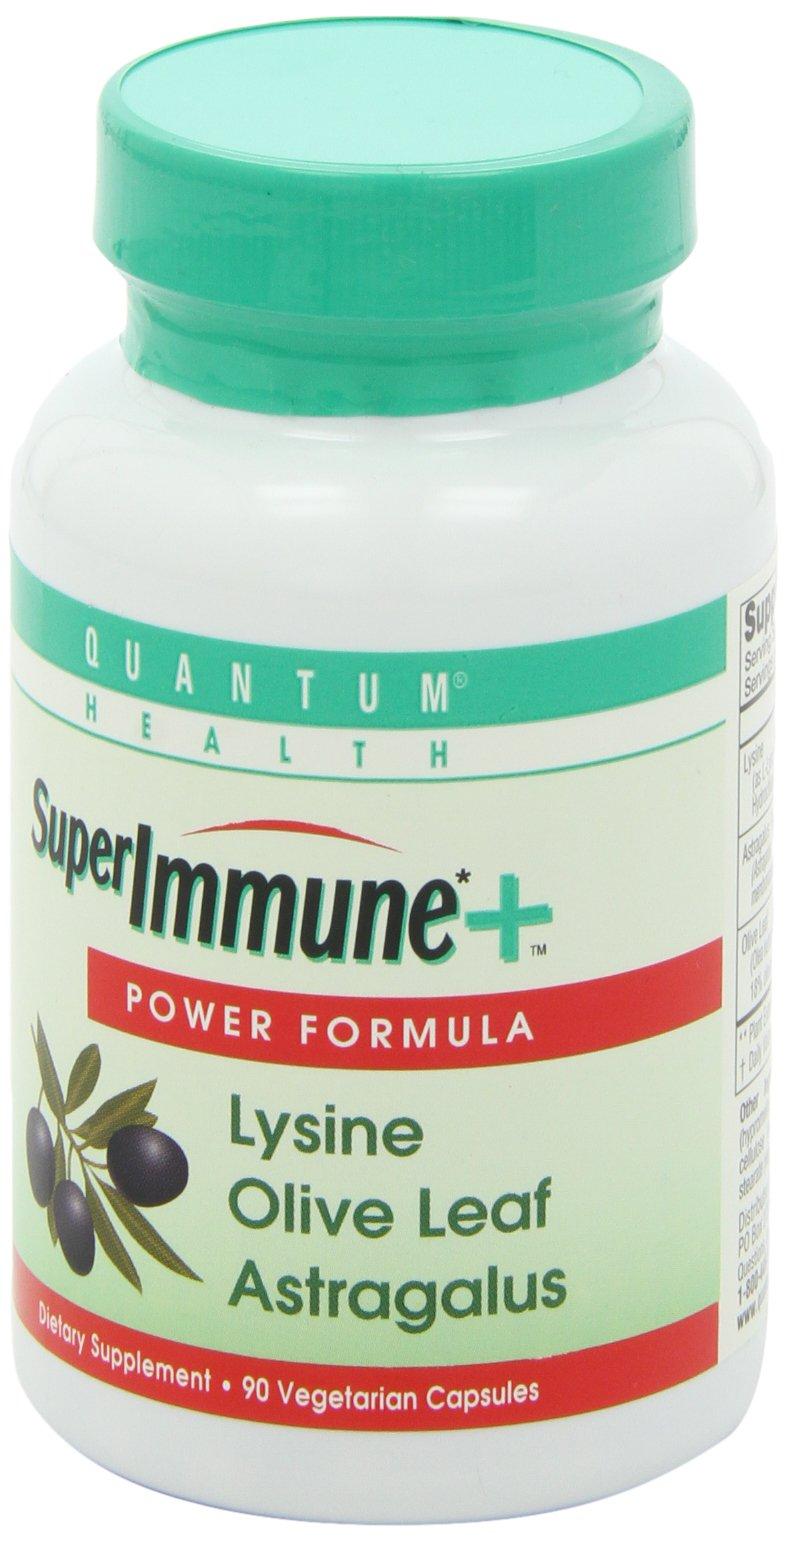 Quantum Health, Super Immune Vegetarian Capsule,  90-Count Packages (Pack of 2)